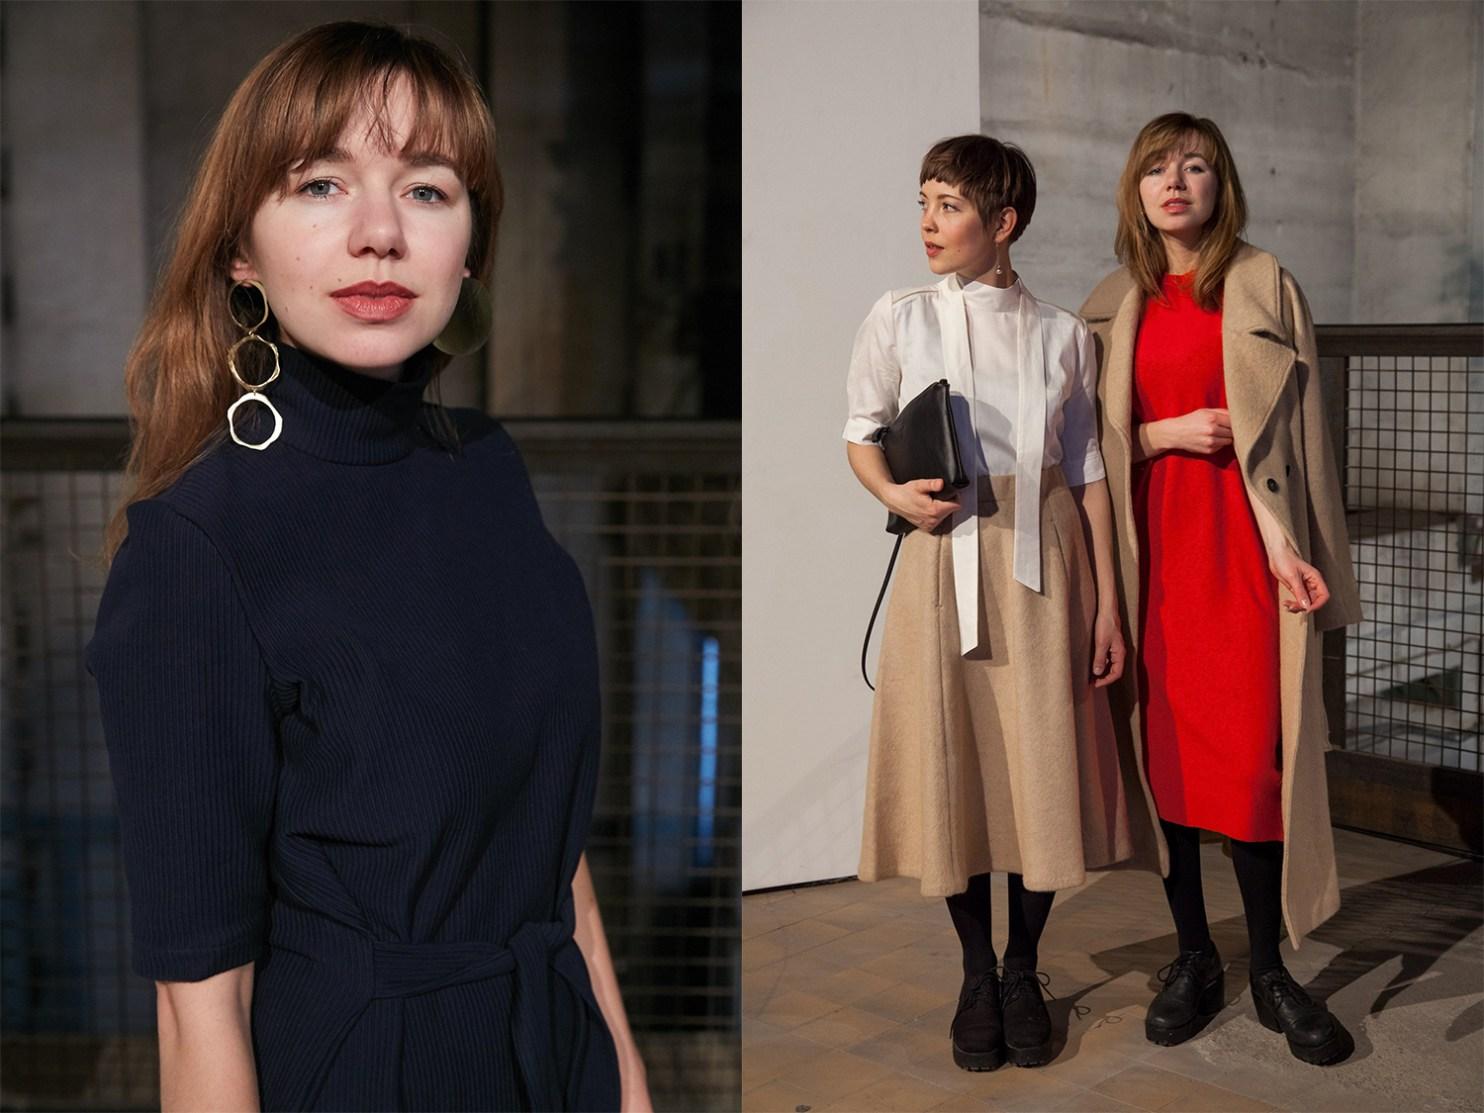 Berlin Fashion Week - Greenshowroom & Ethical Fashion Show